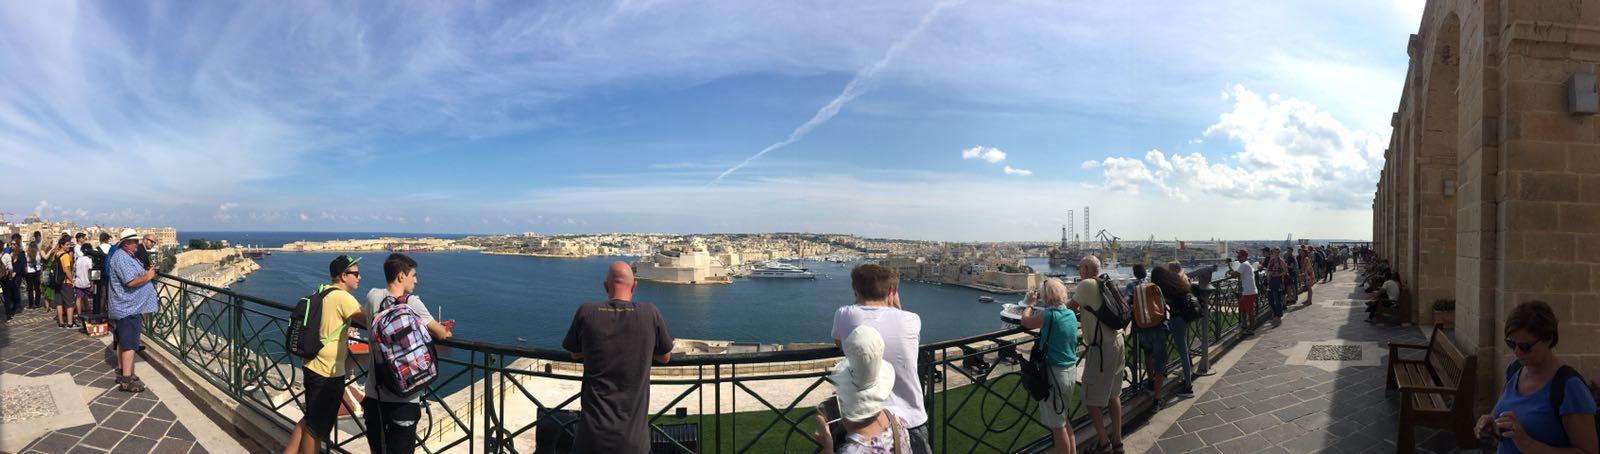 #CheapflightsChallenge Malta 2